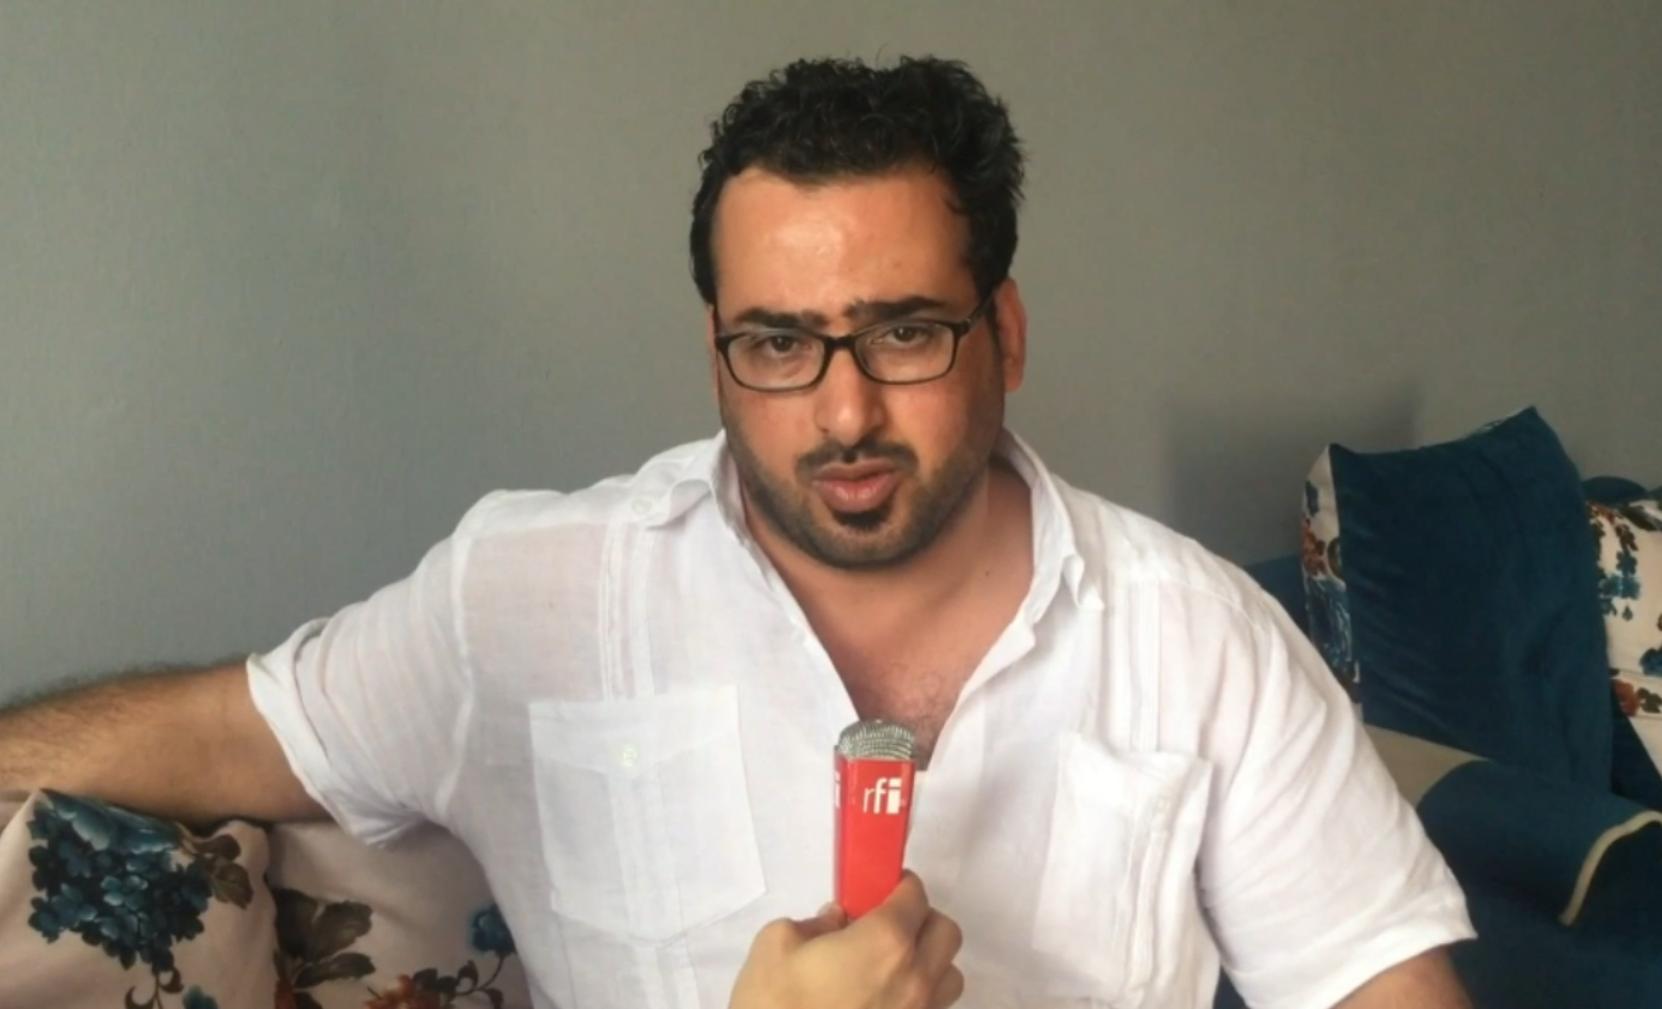 Le journaliste irakien Muntadhar Al Zaïdi reçoit RFI chez lui à Baghdad